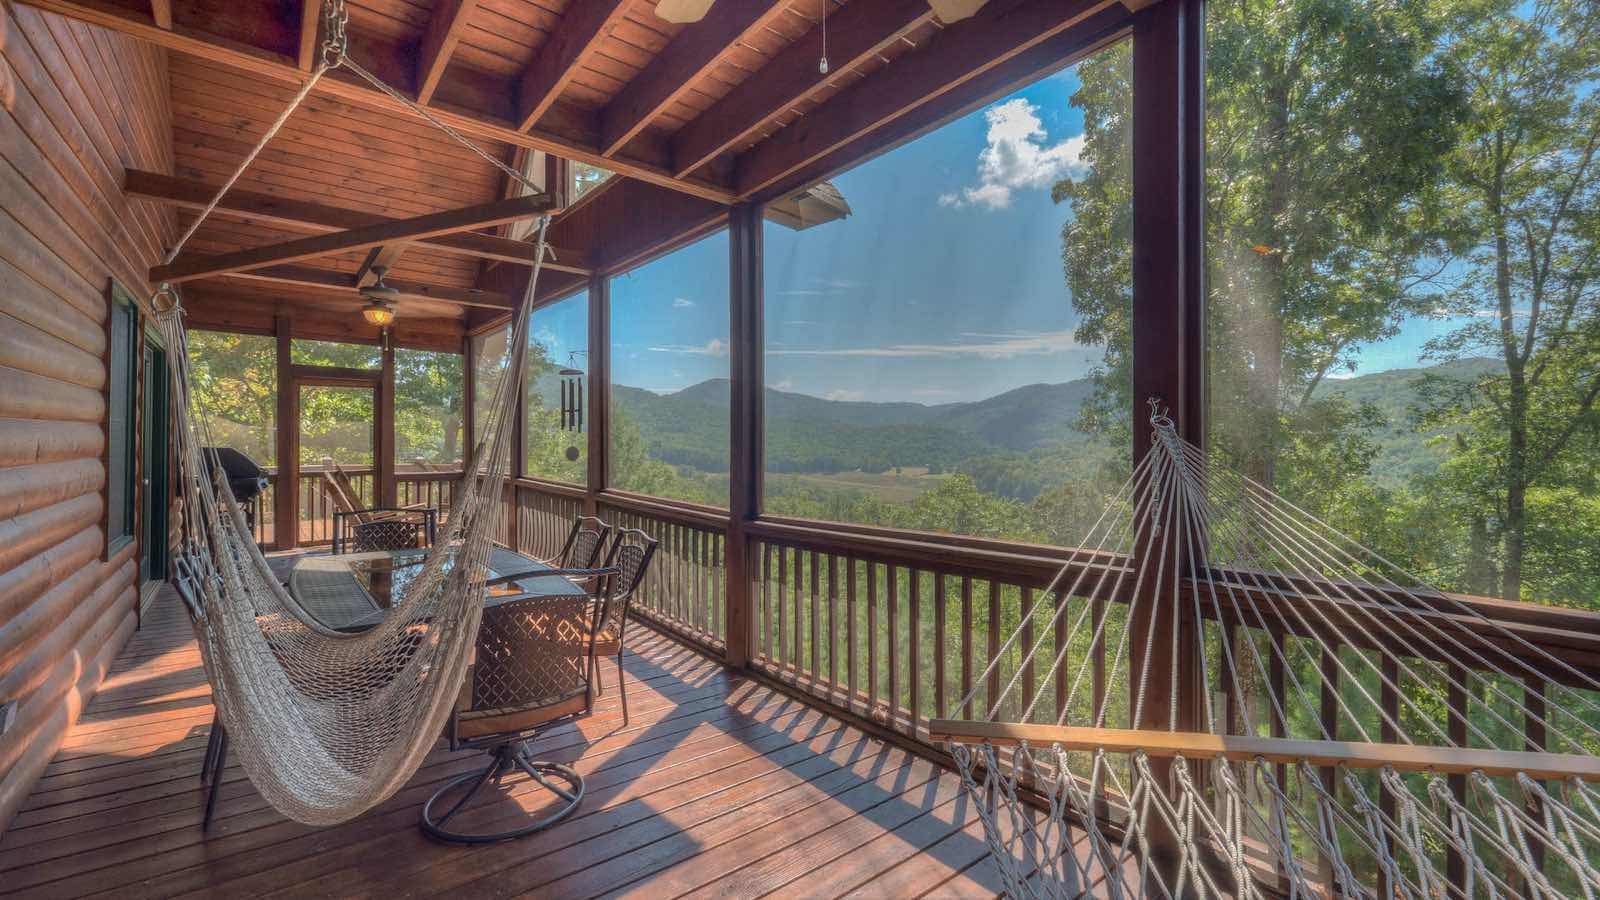 Big Sky View Rental Cabin - Blue Ridge, GA